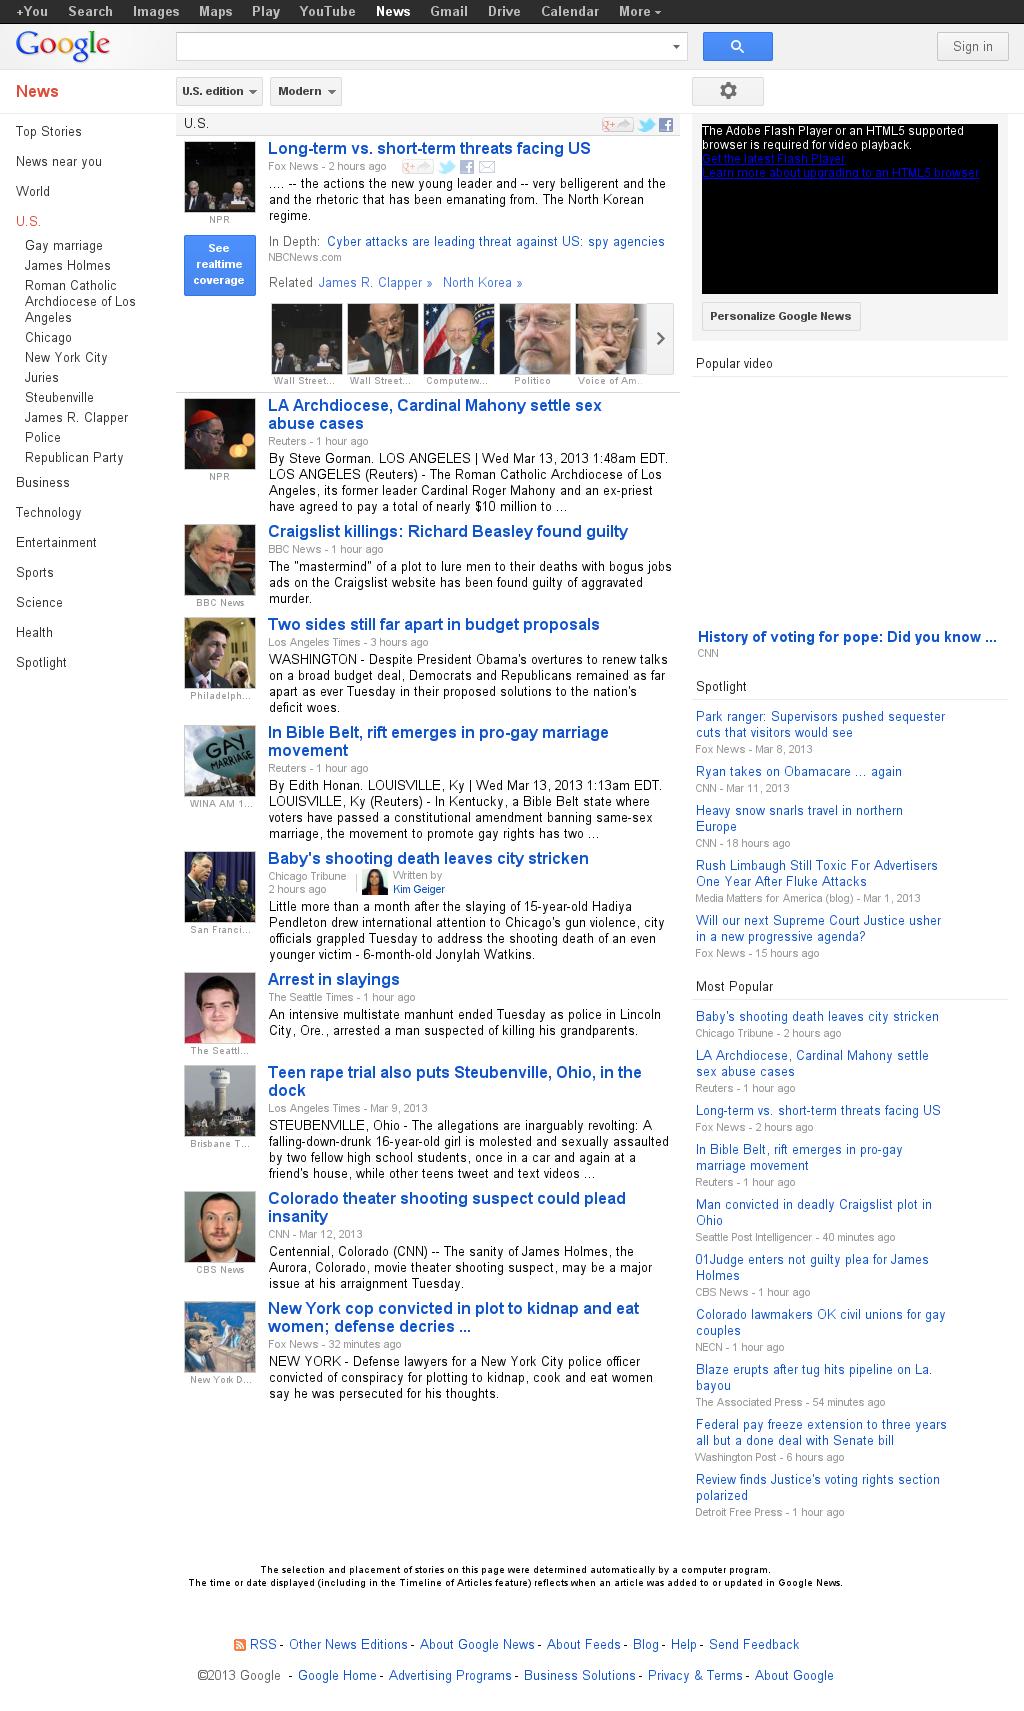 Google News: U.S. at Wednesday March 13, 2013, 7:08 a.m. UTC